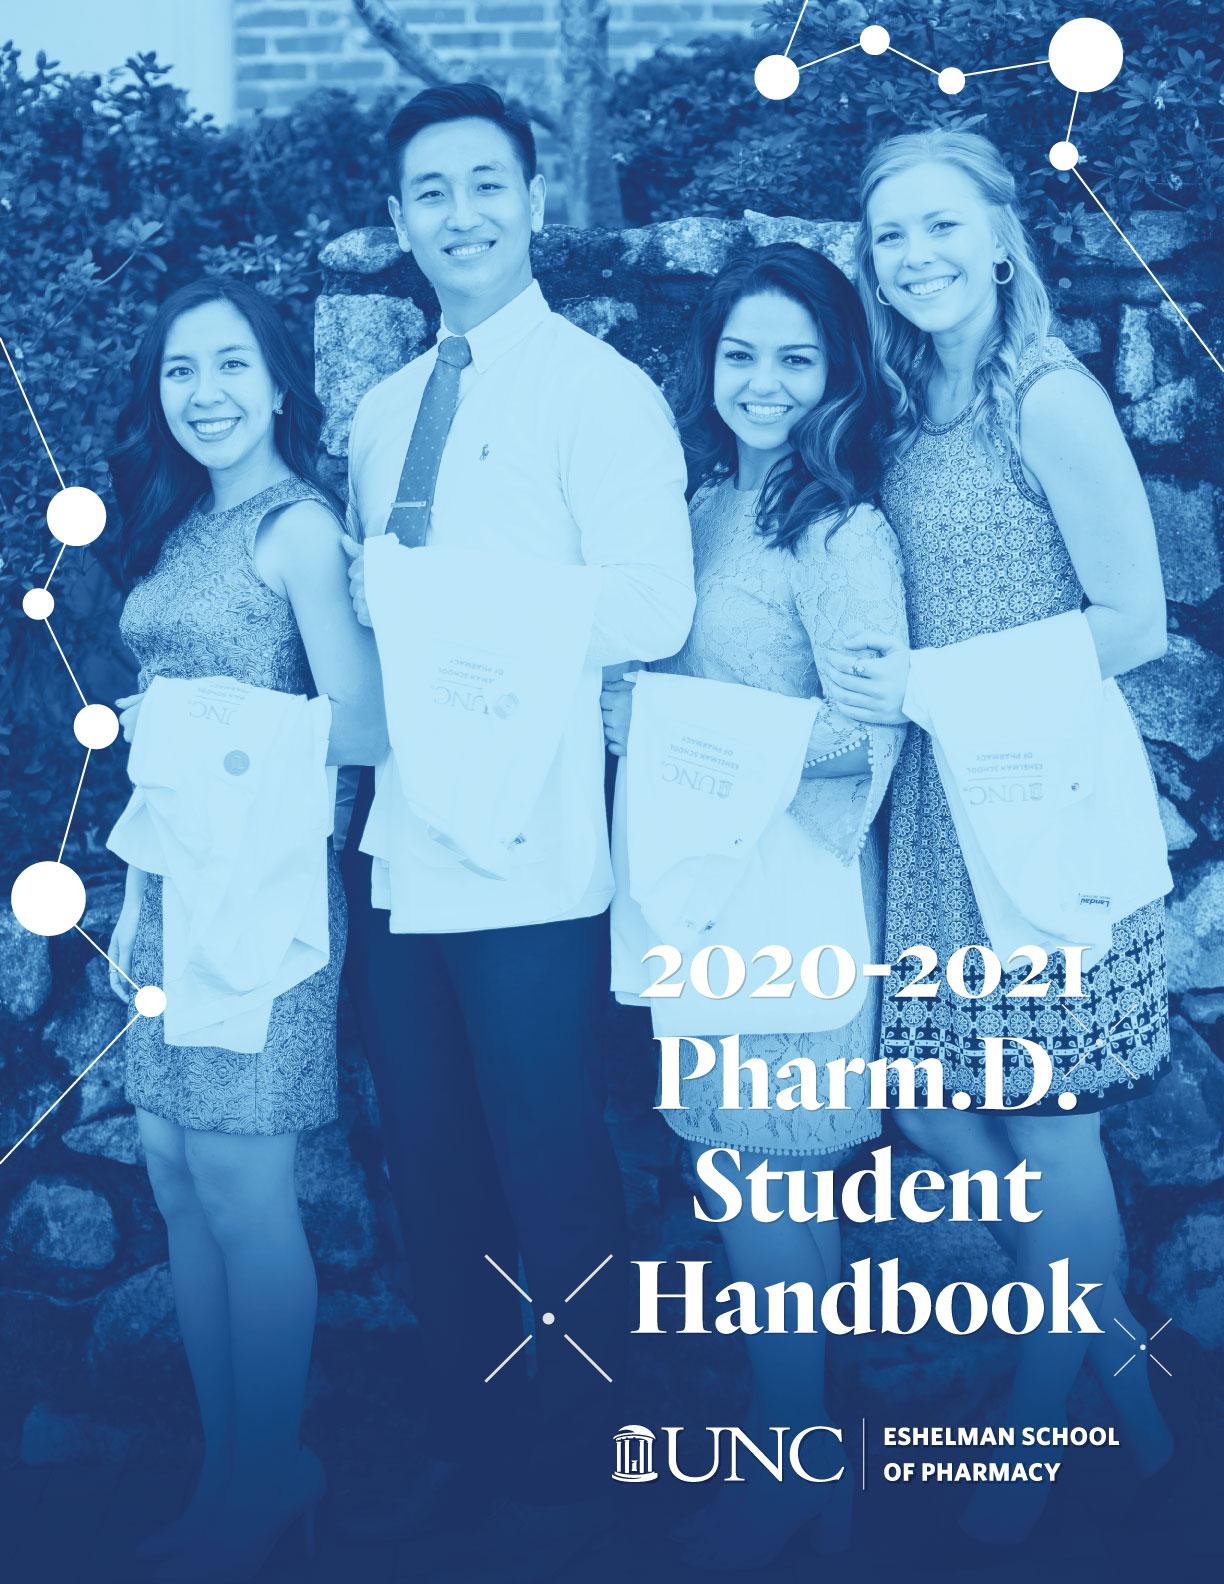 PharmD_Handbook_Cover_image_2020-21